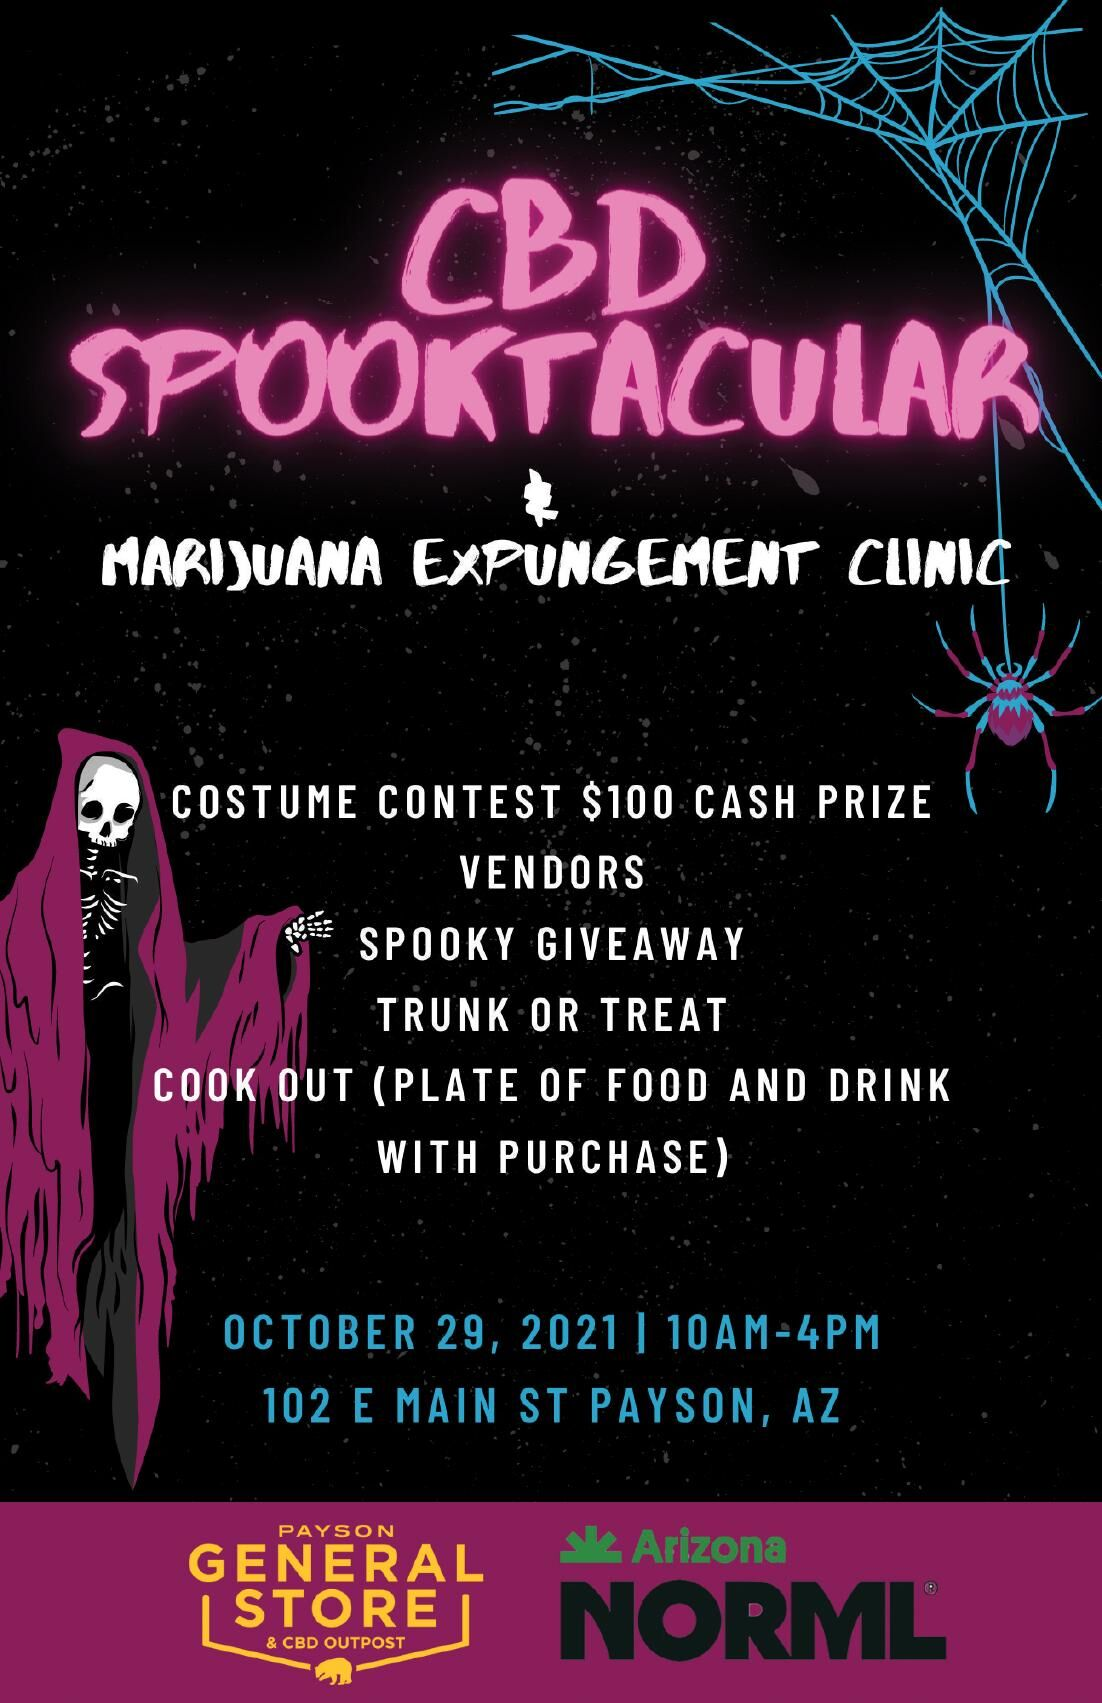 CBD Spooktacular